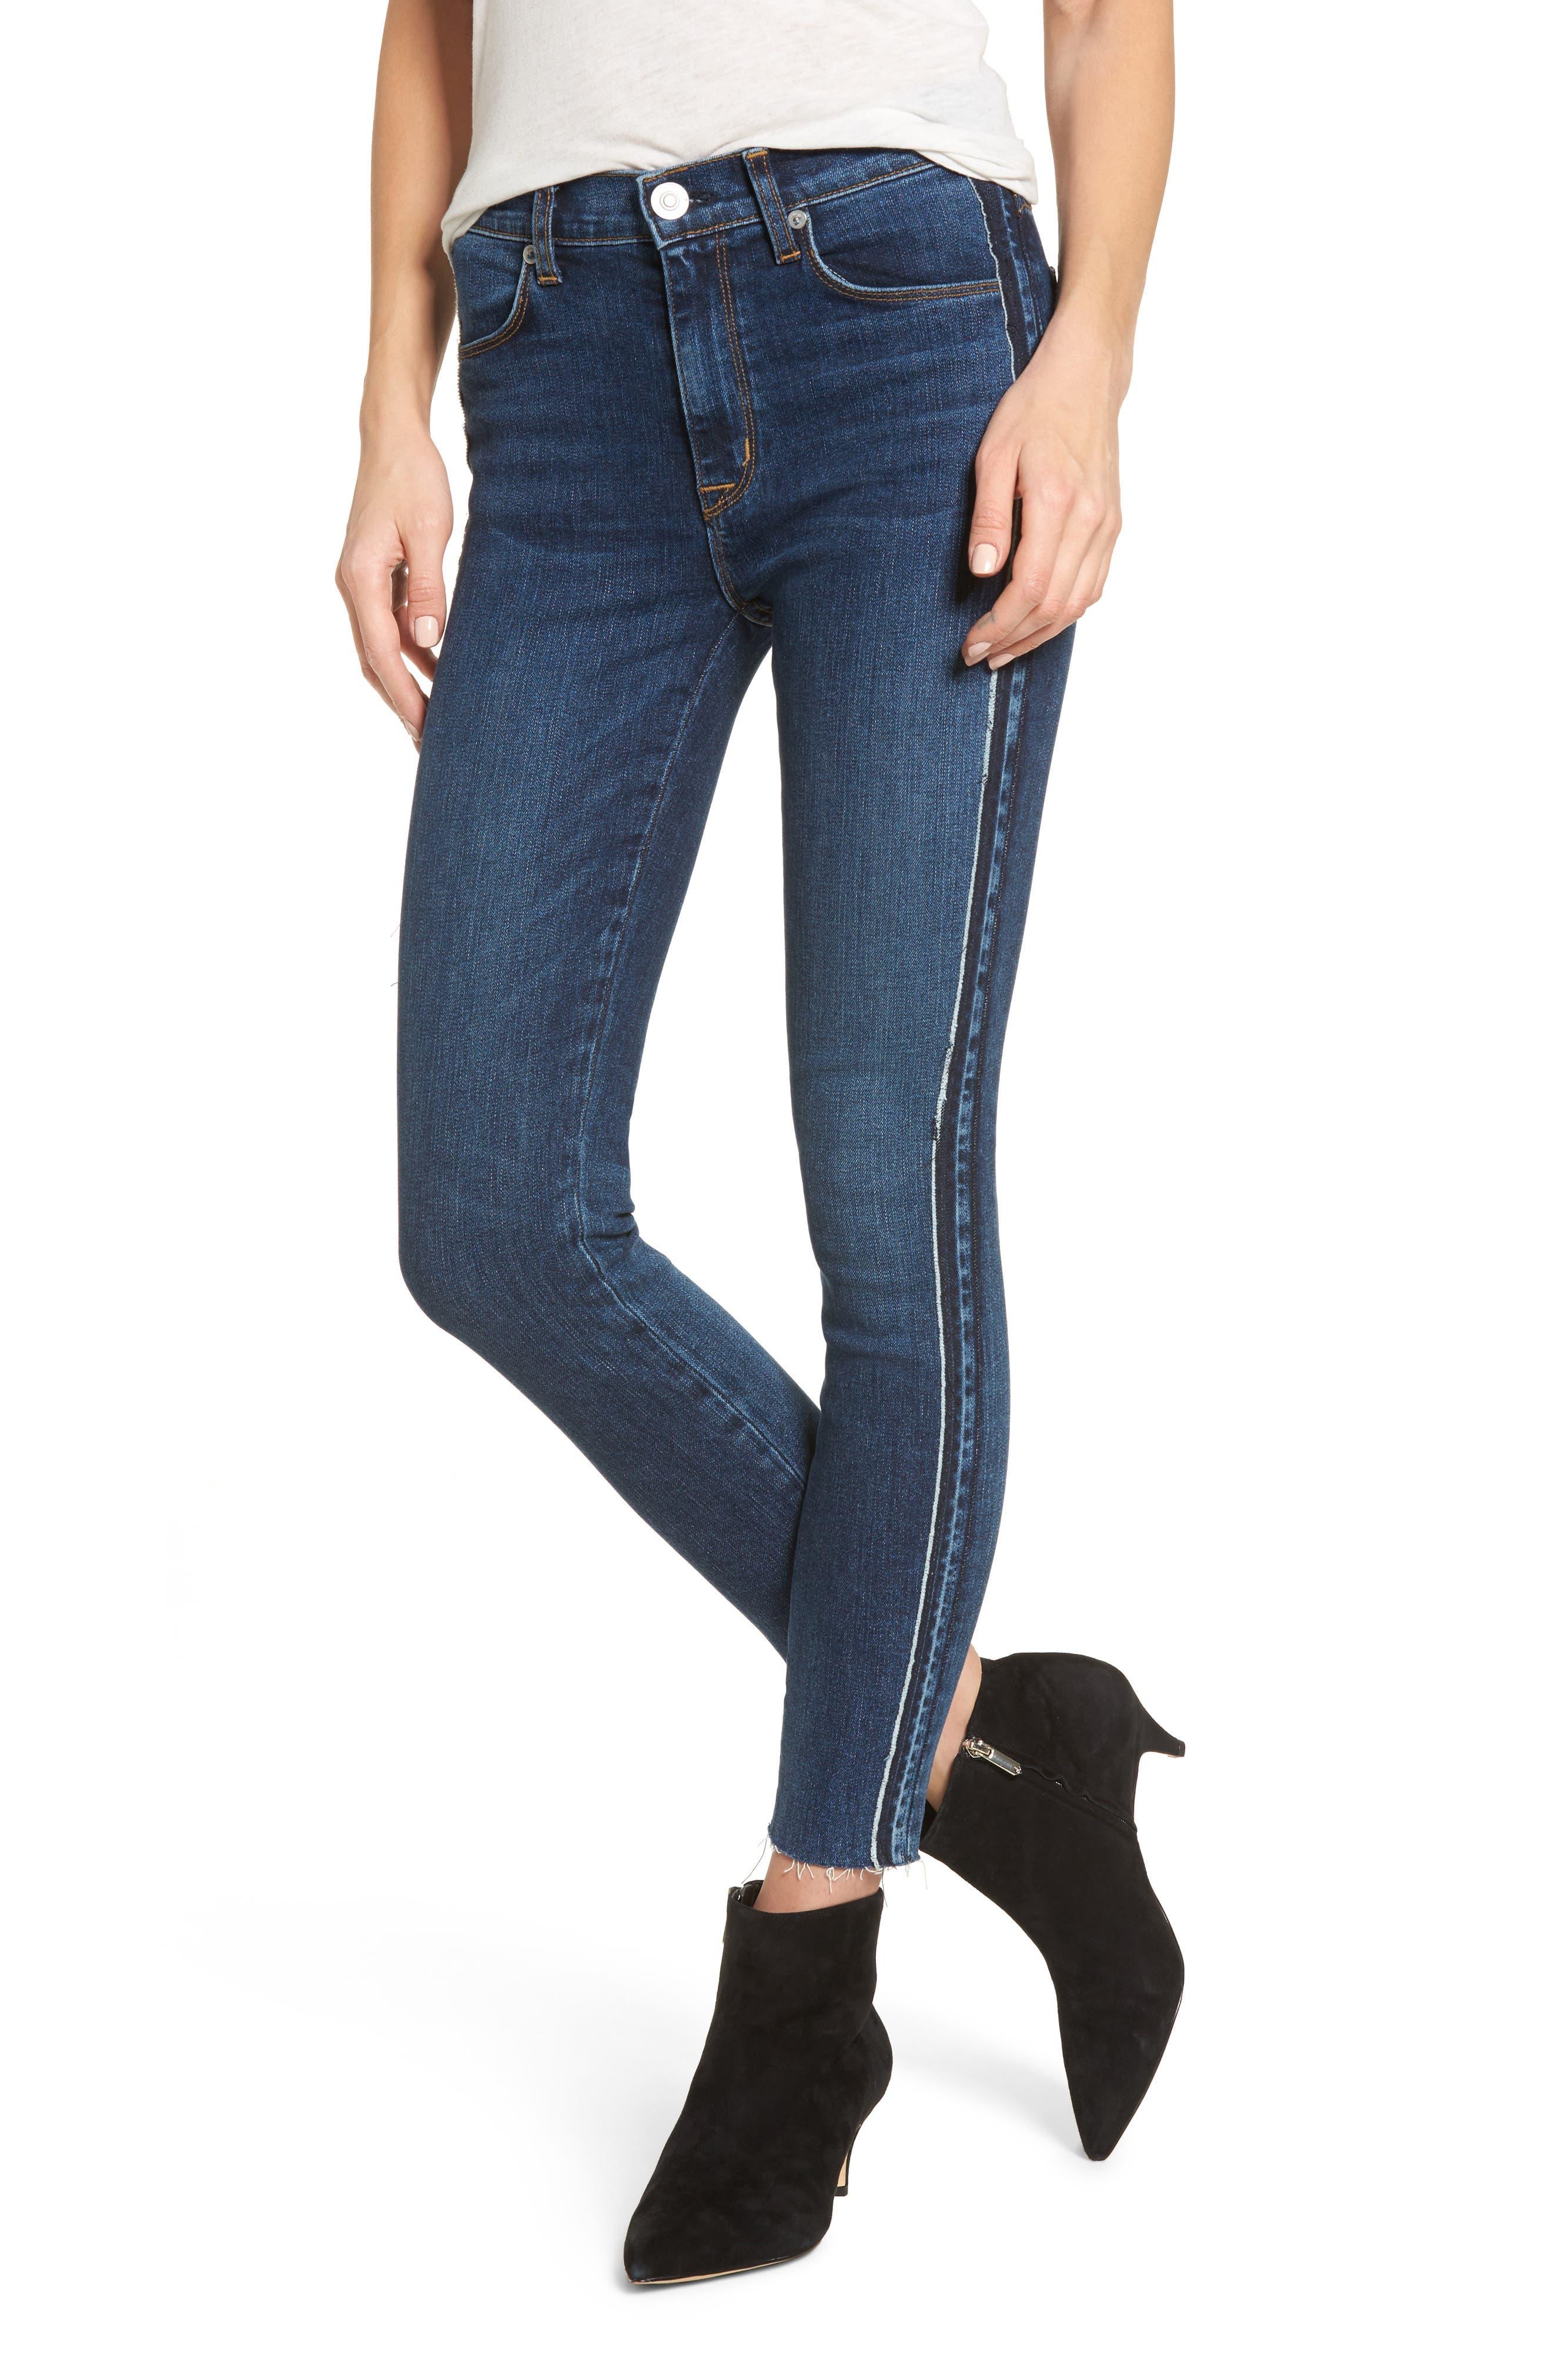 Main Image - Hudson Jeans Barbara High Waist Super Skinny Jeans (Fatal)